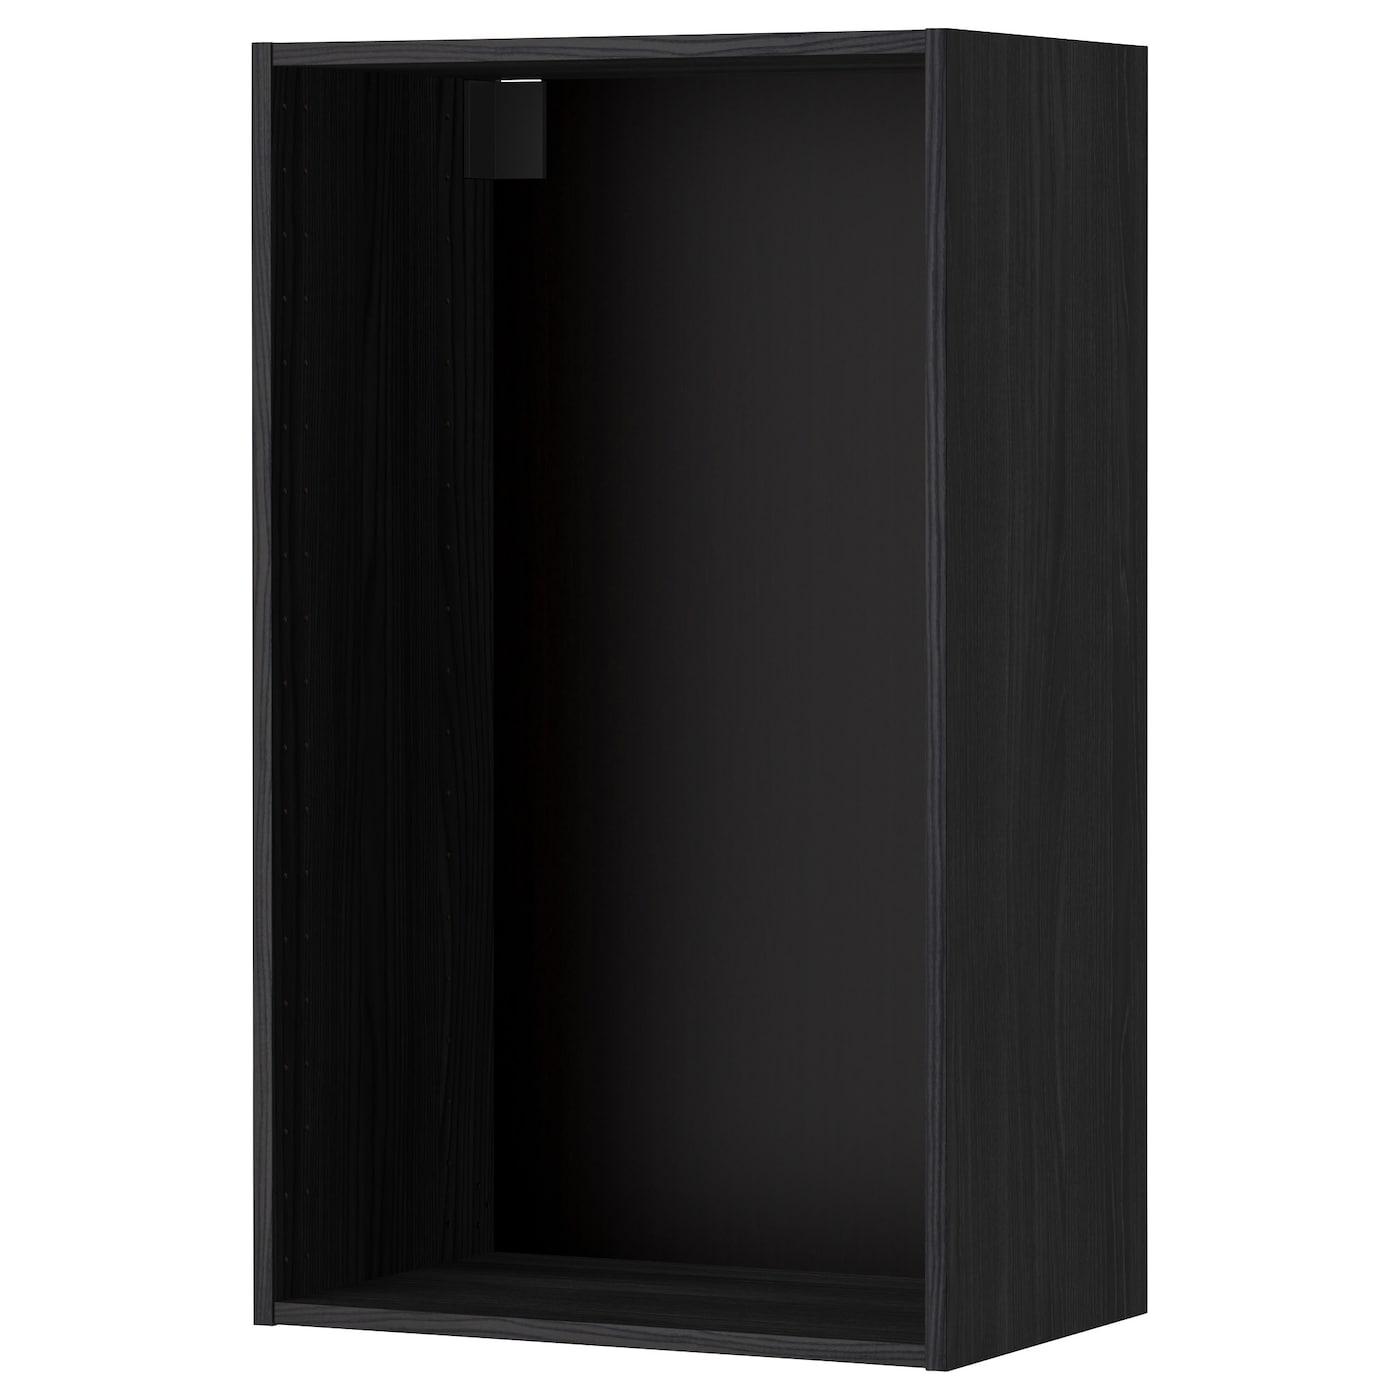 Metod Wall Cabinet Frame Wood Effect Black 60 X 37 X 100